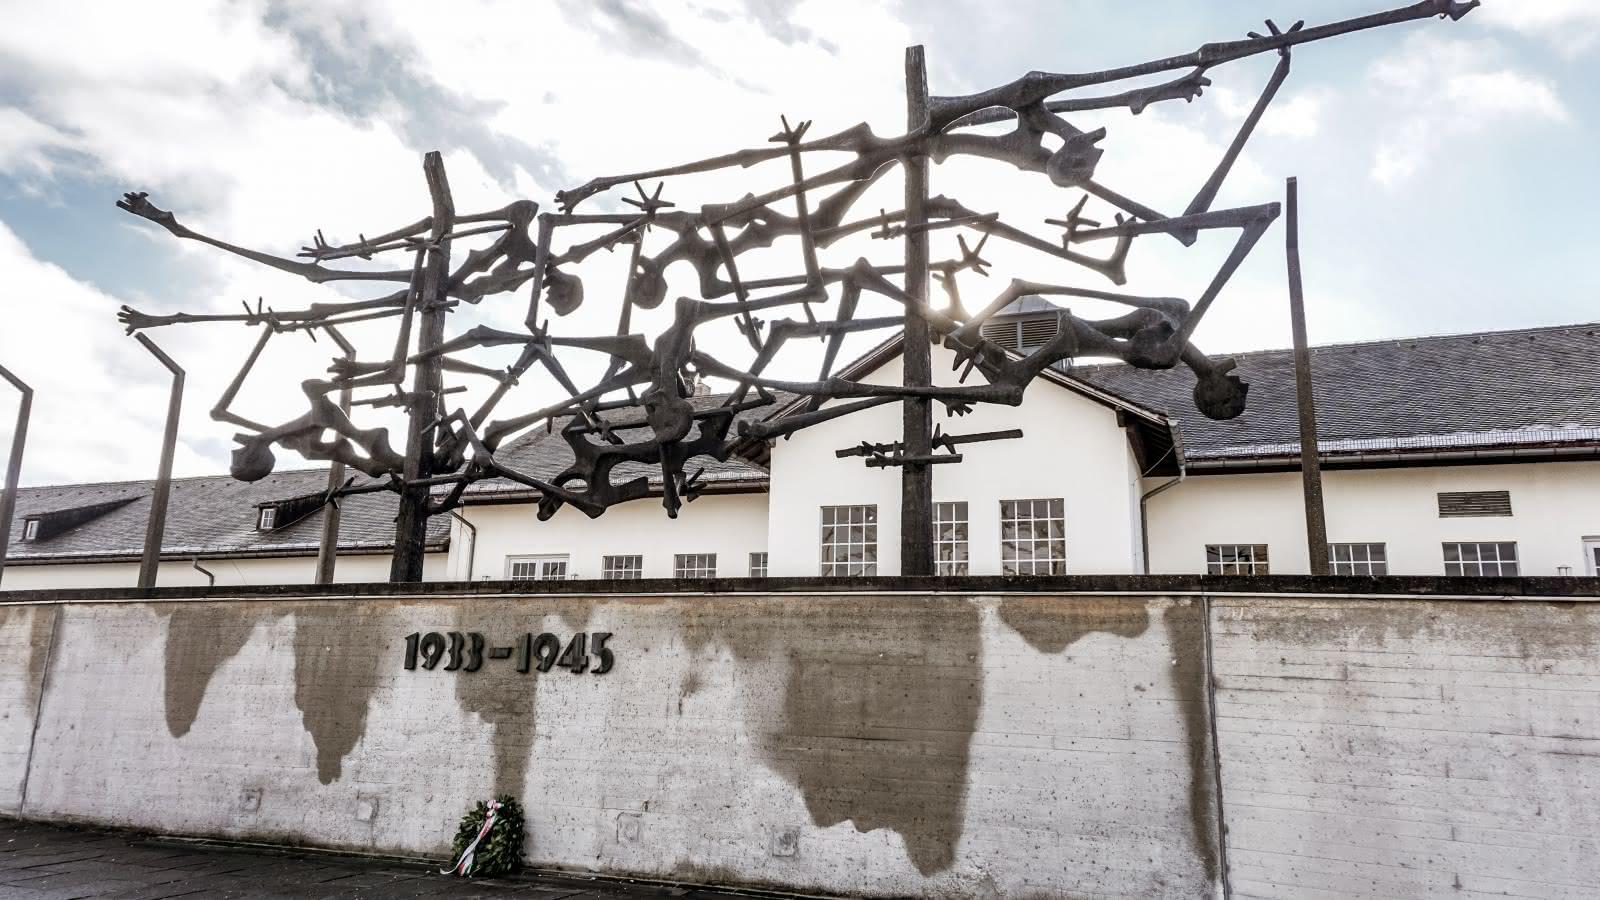 Dachau Concentration Camp Memorial Tour